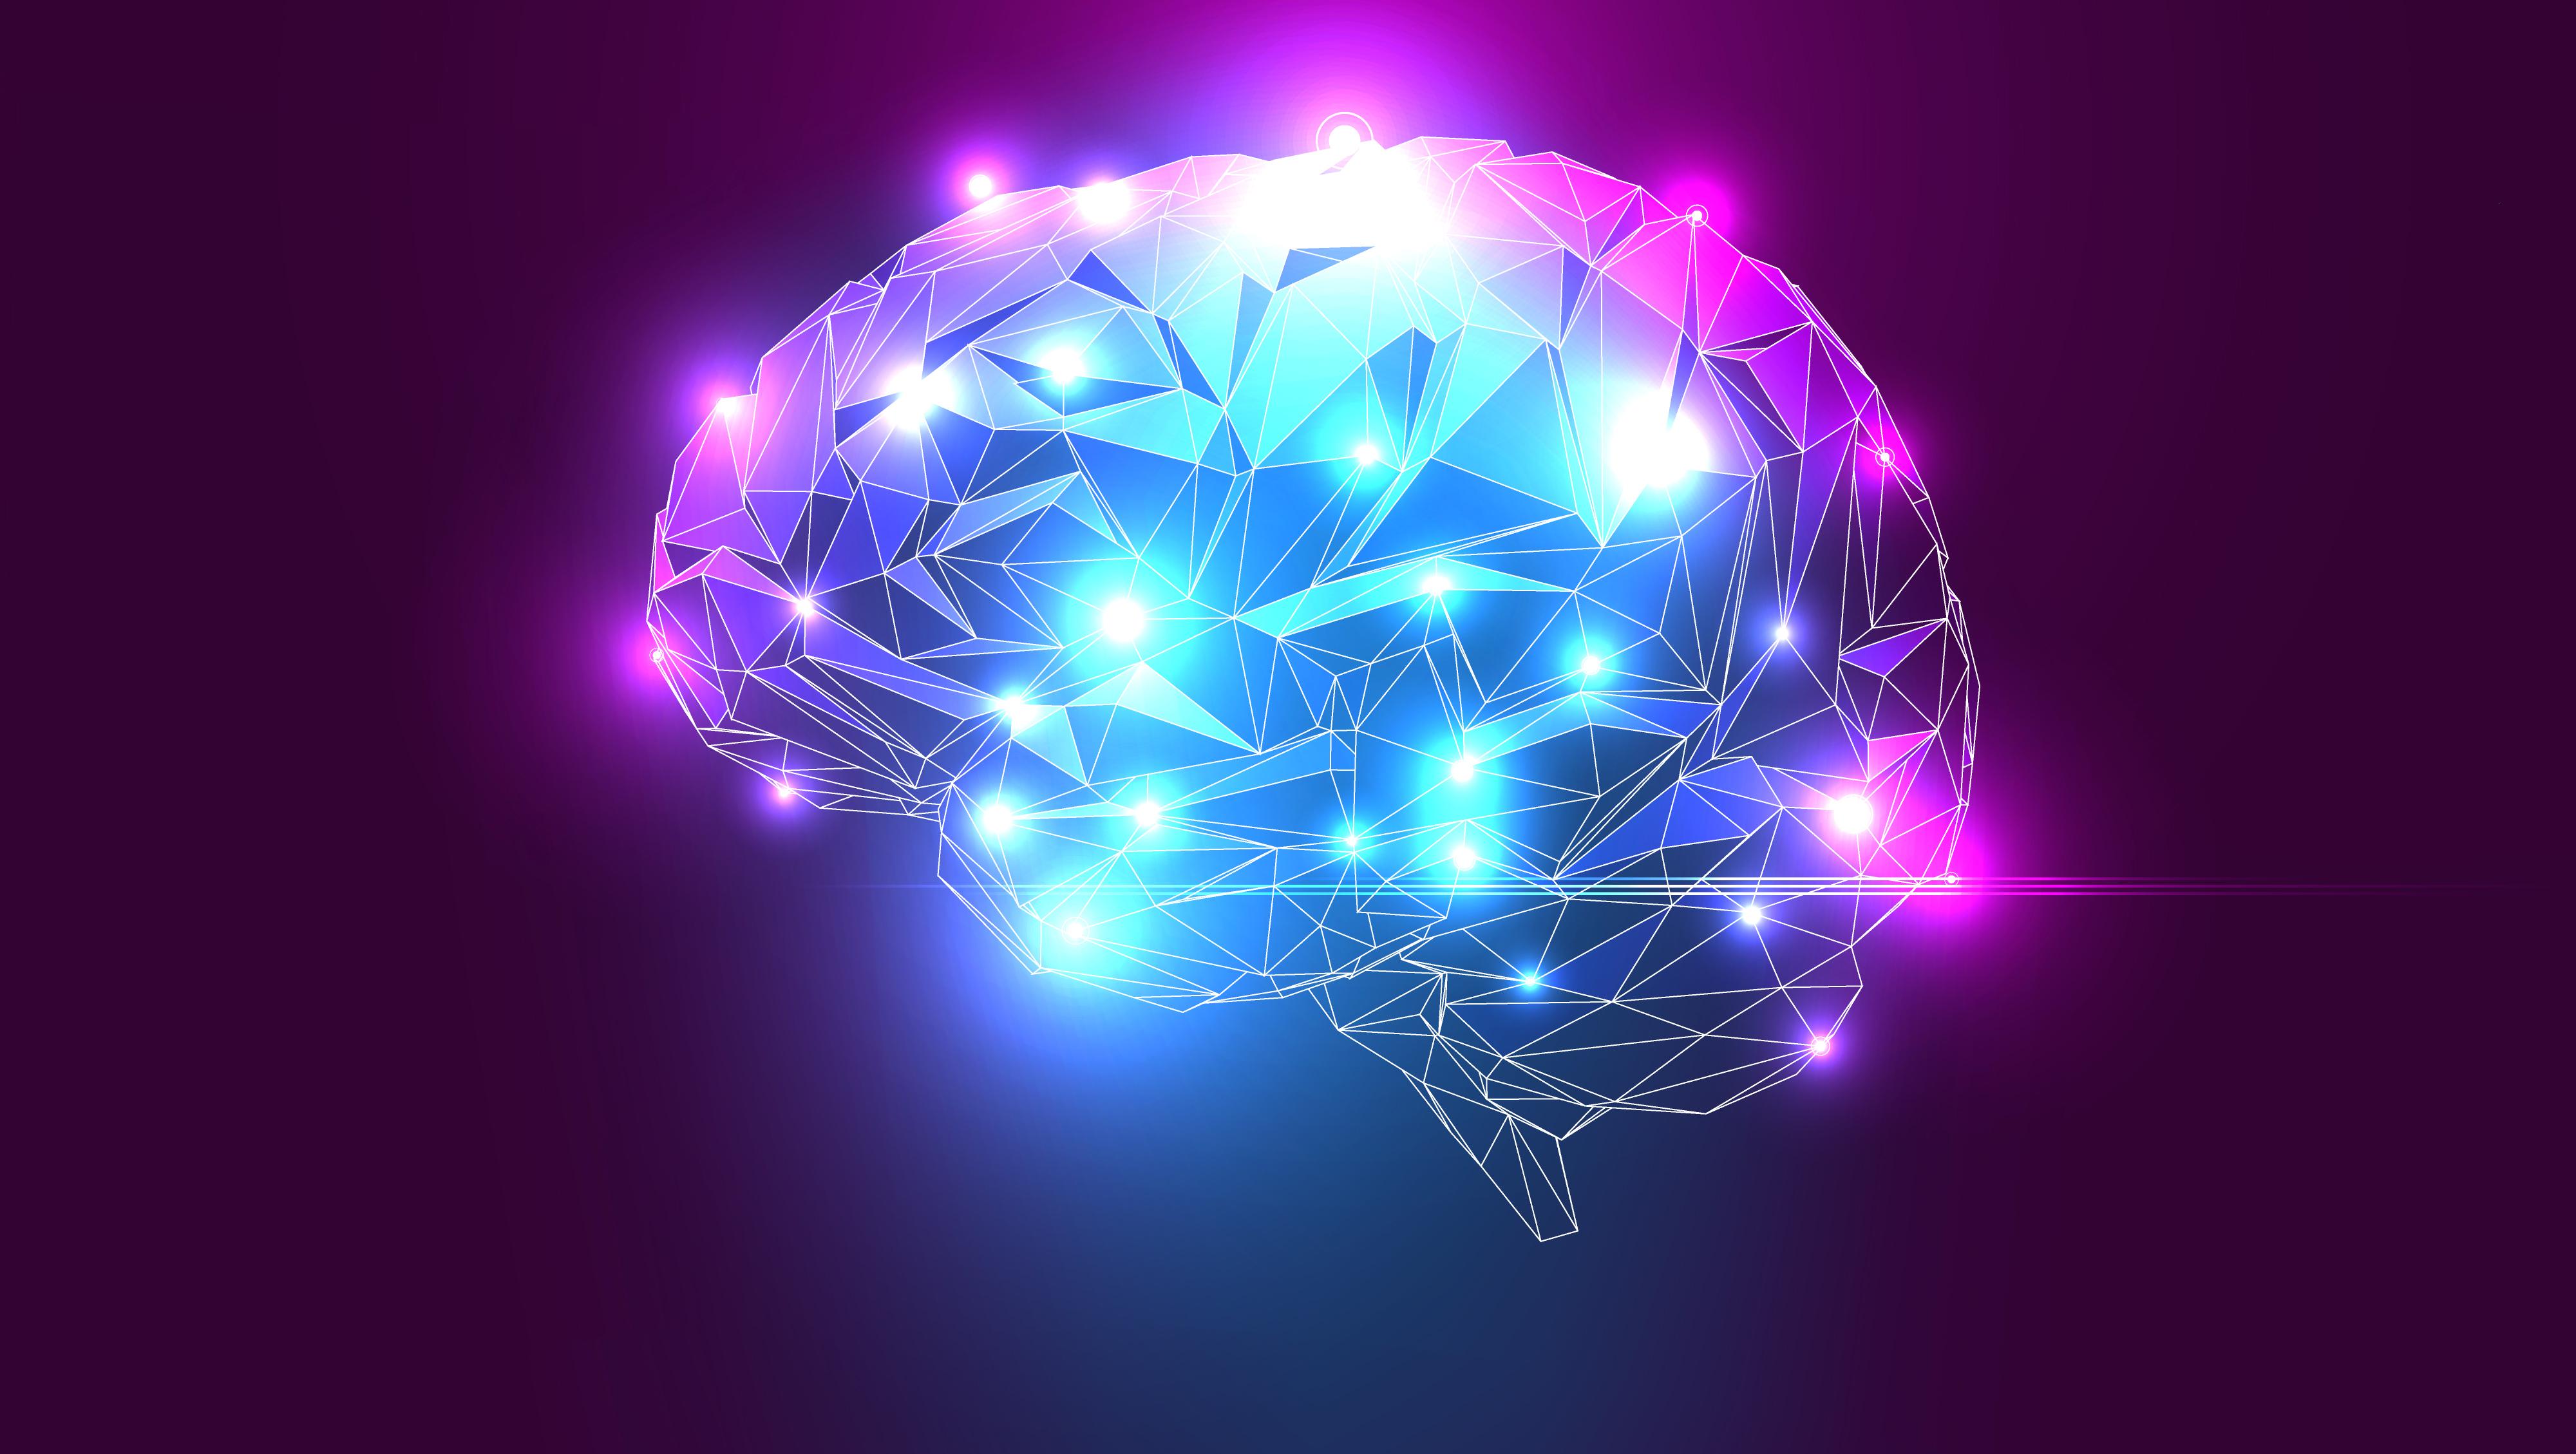 Best 56 Brainwave Backgrounds on HipWallpaper Brainwave 4000x2258